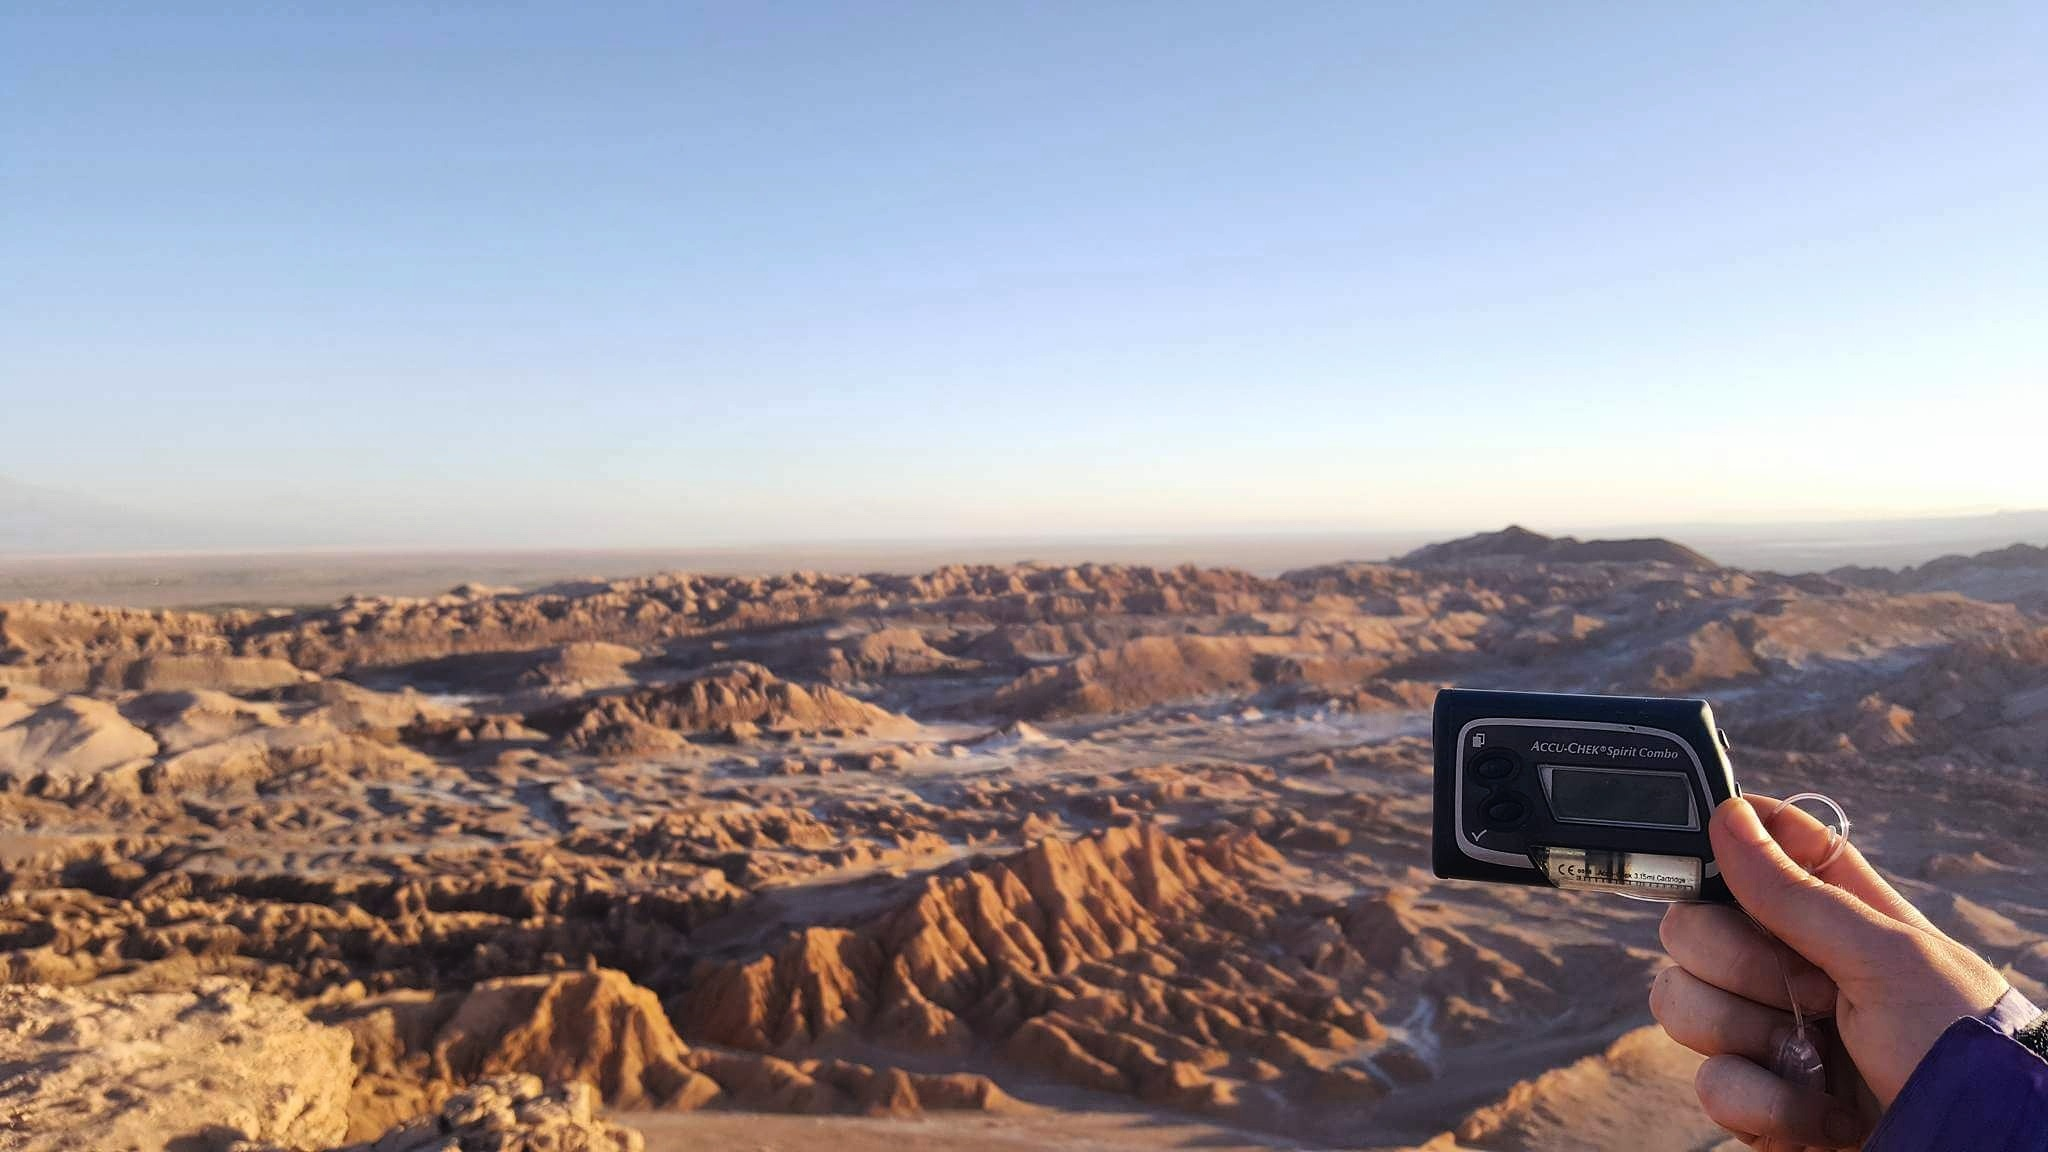 Insulin pump in the Atacama desert